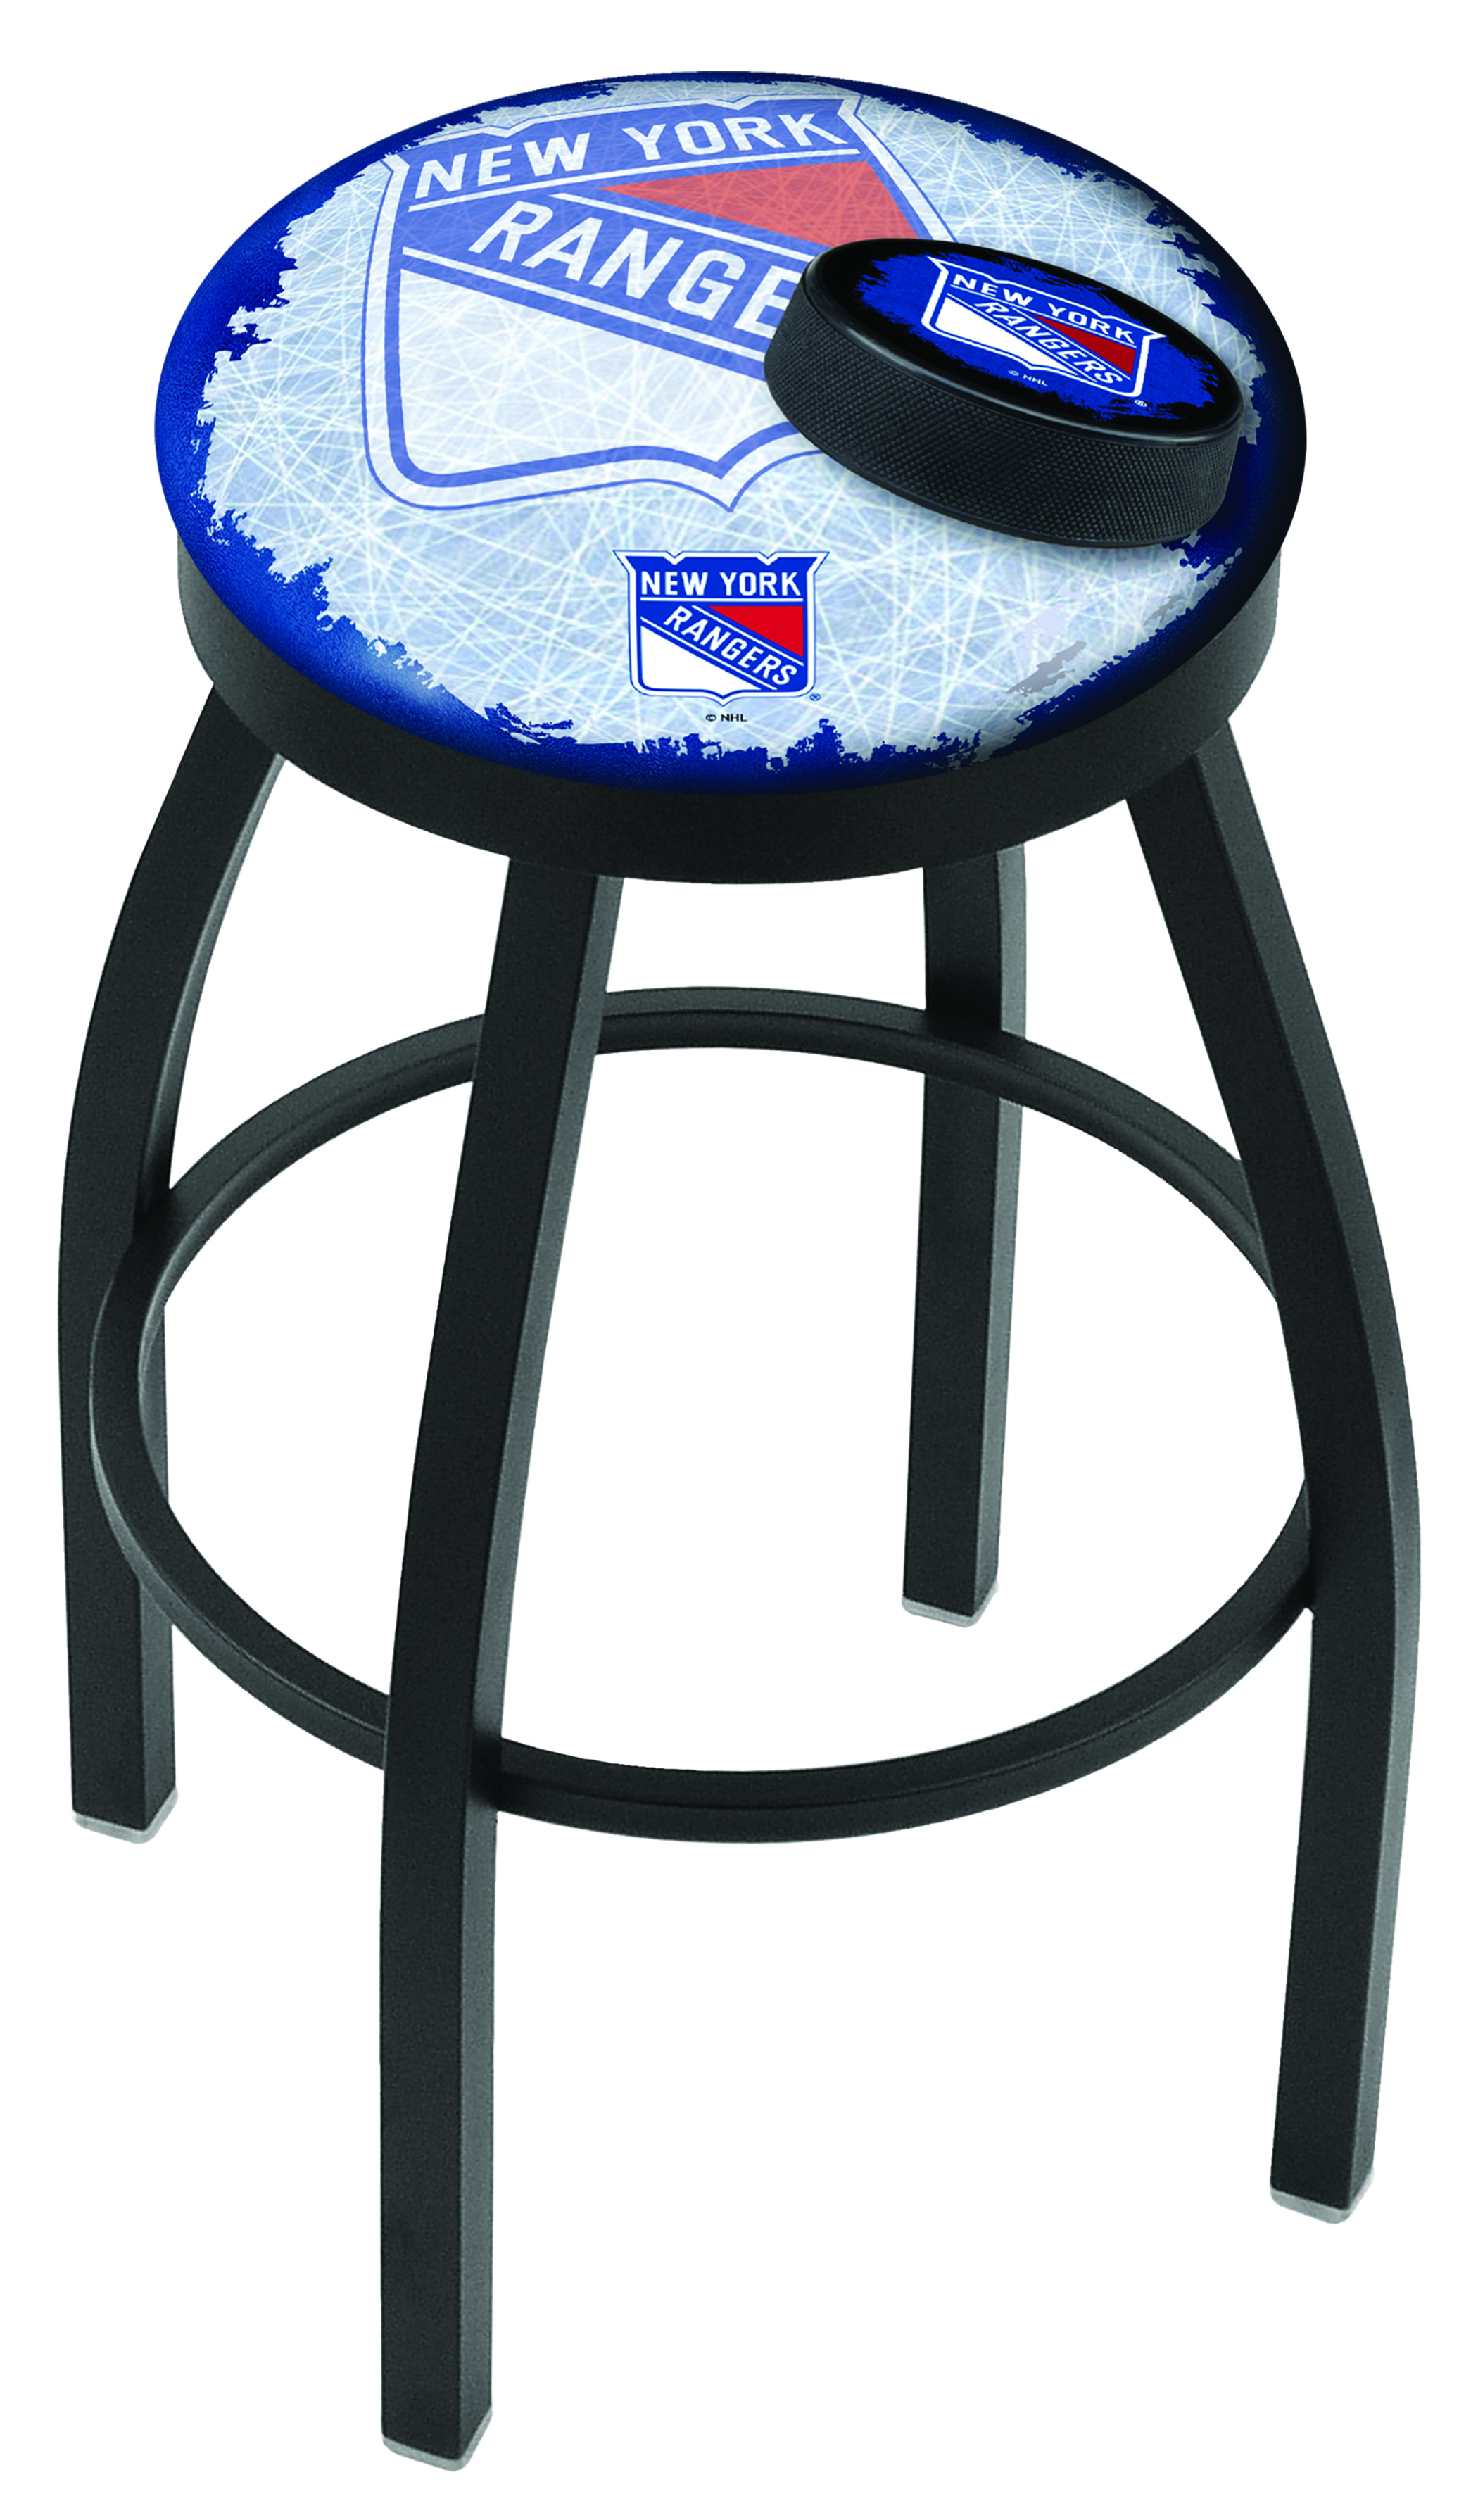 New York Rangers Spectator Chair L8b2b By Holland Bar Stool Co